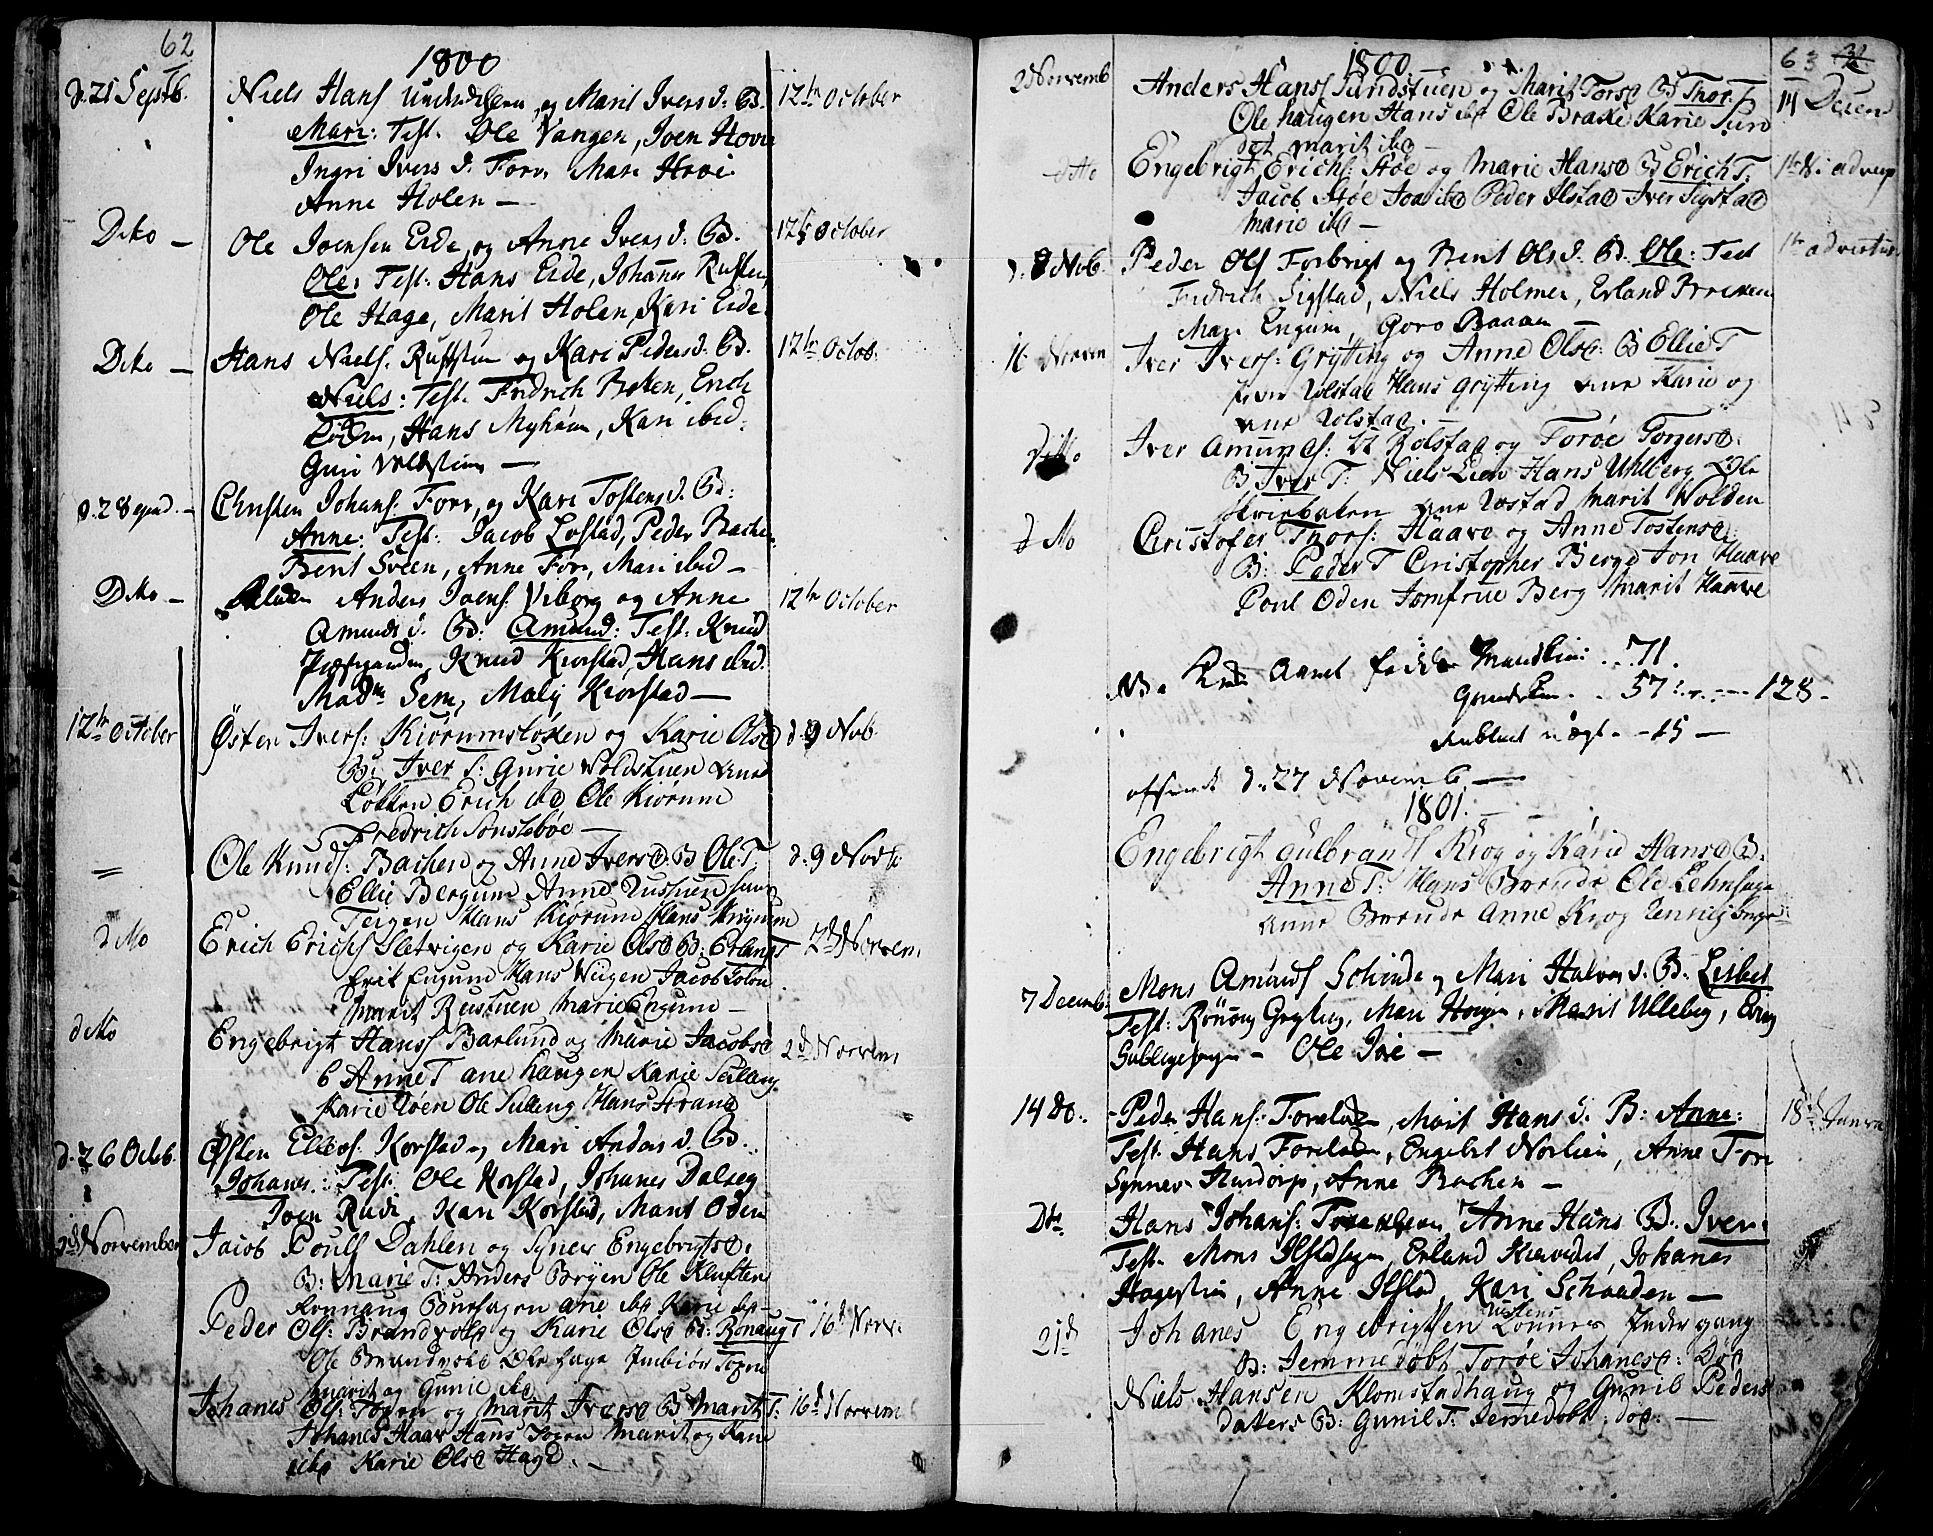 SAH, Fron prestekontor, H/Ha/Haa/L0001: Ministerialbok nr. 1, 1799-1816, s. 62-63